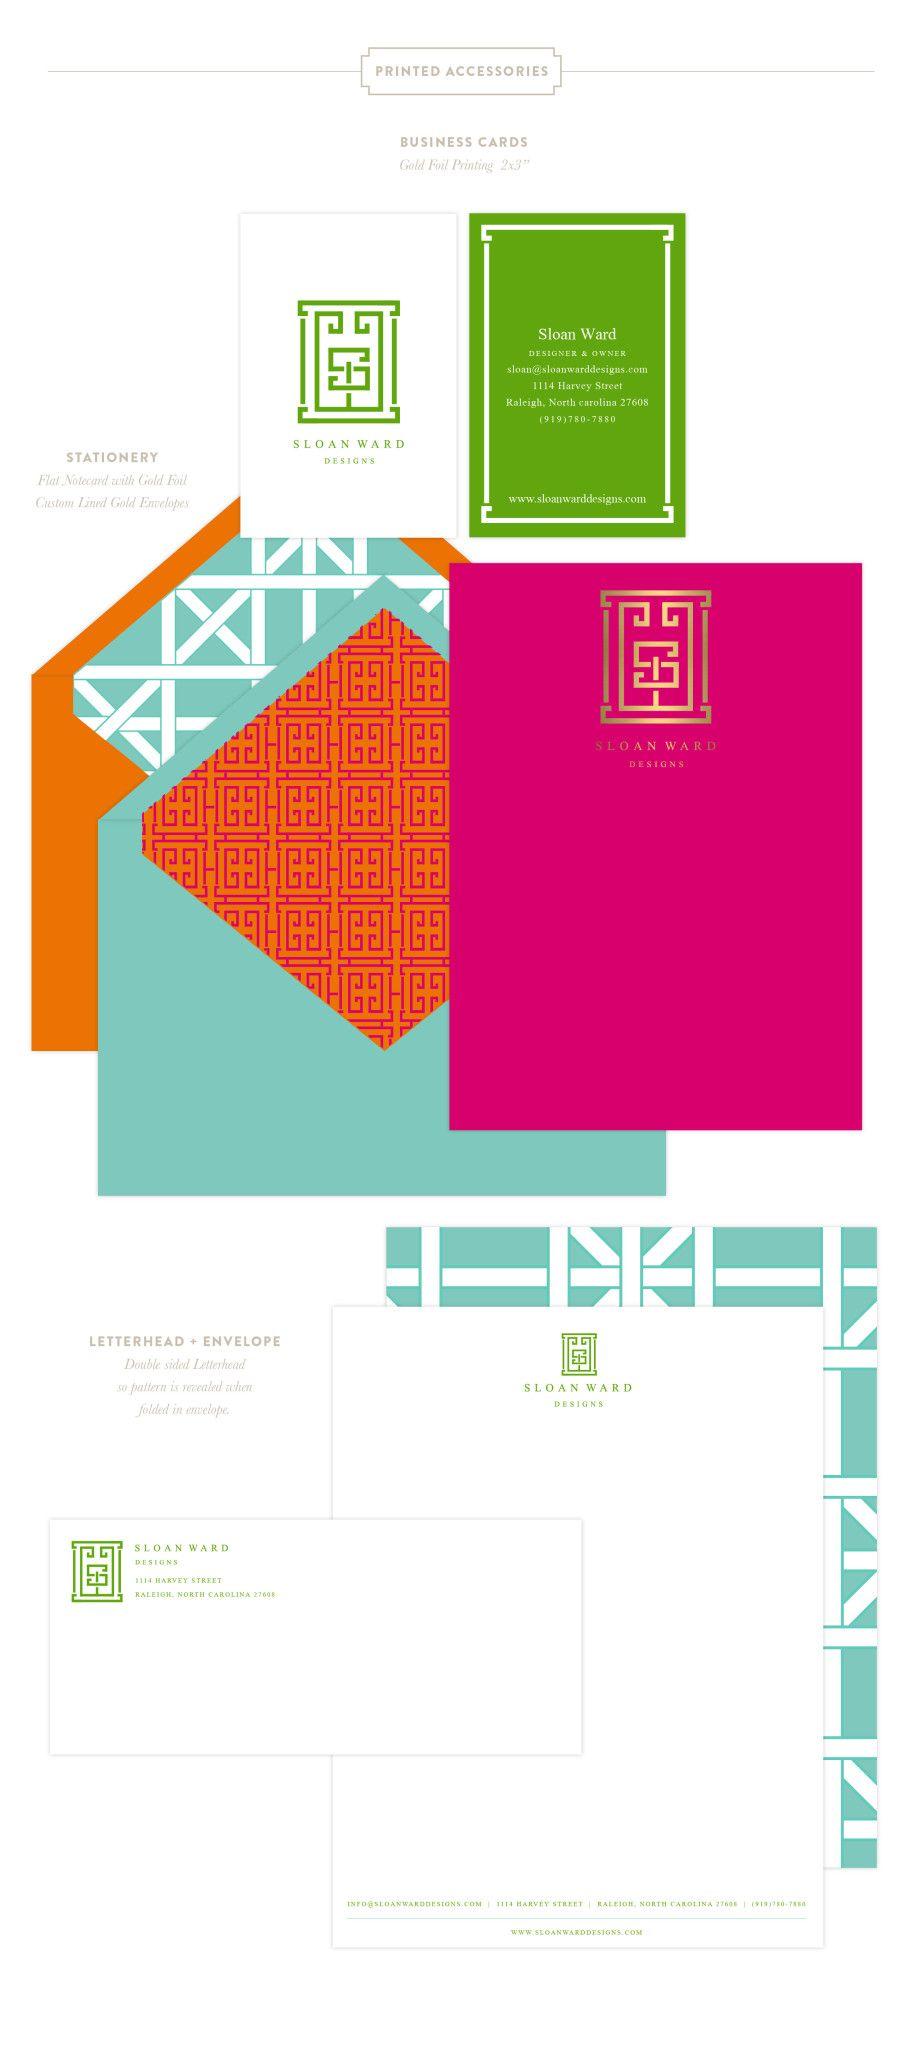 Emily McCarthy Branding | Sloan Ward Designs Printed Materials | www.emilymccarthy.com #branding